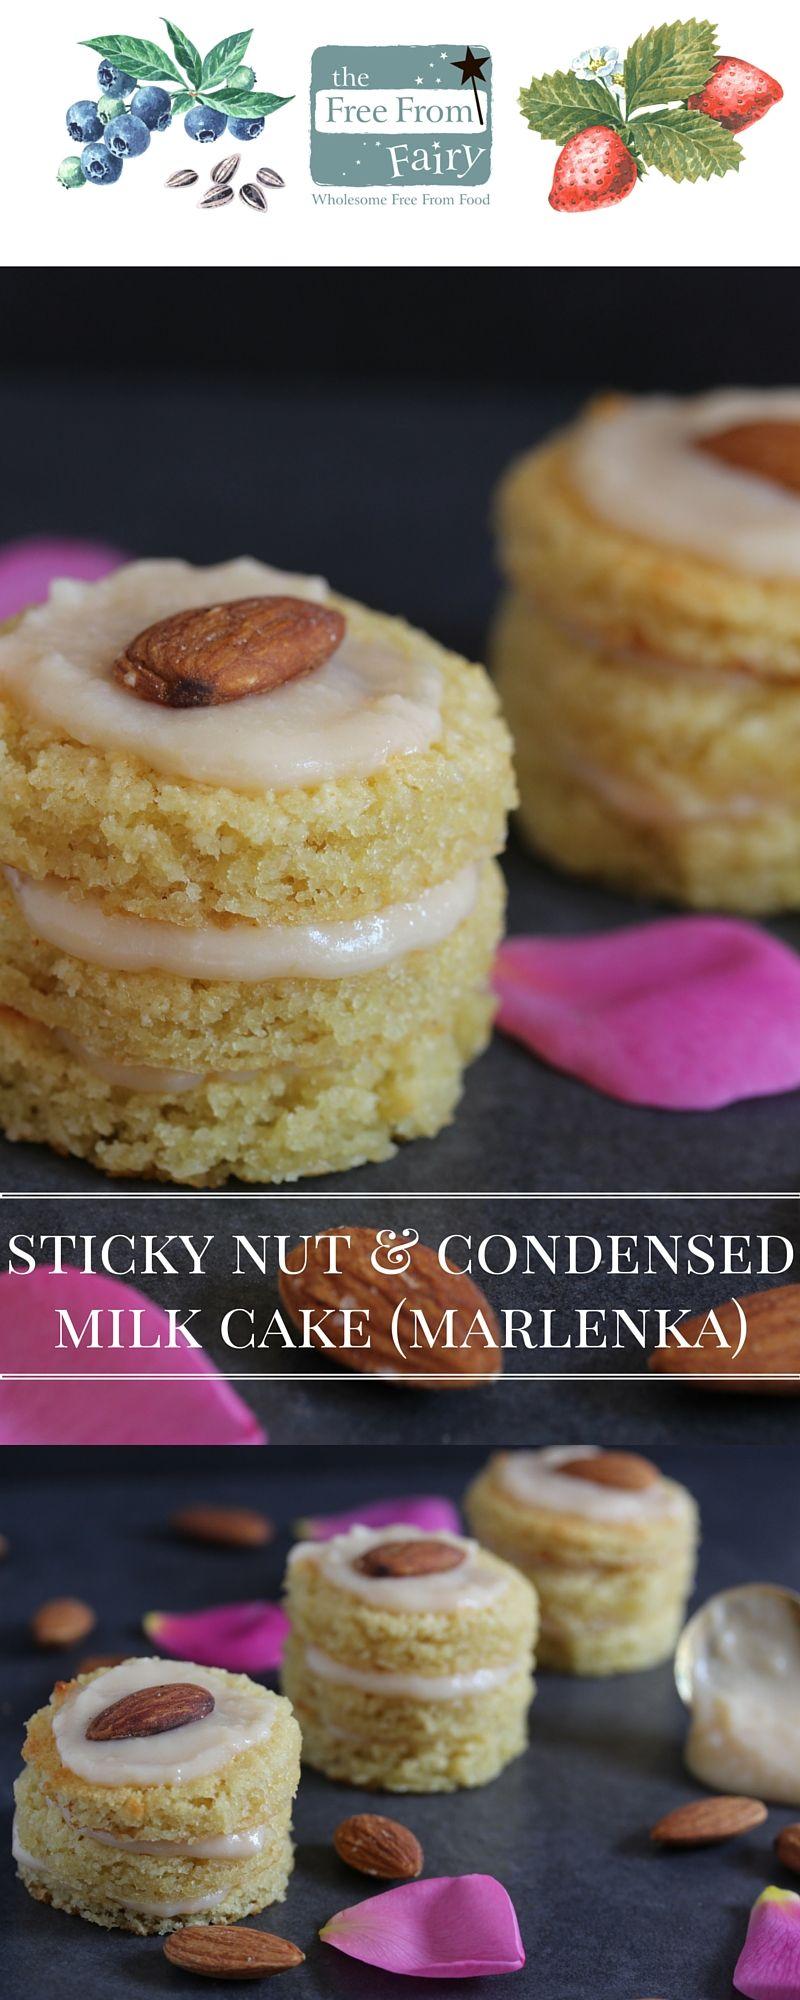 Marlenka & Condensed Milk | Recipe | Low sugar recipes ...